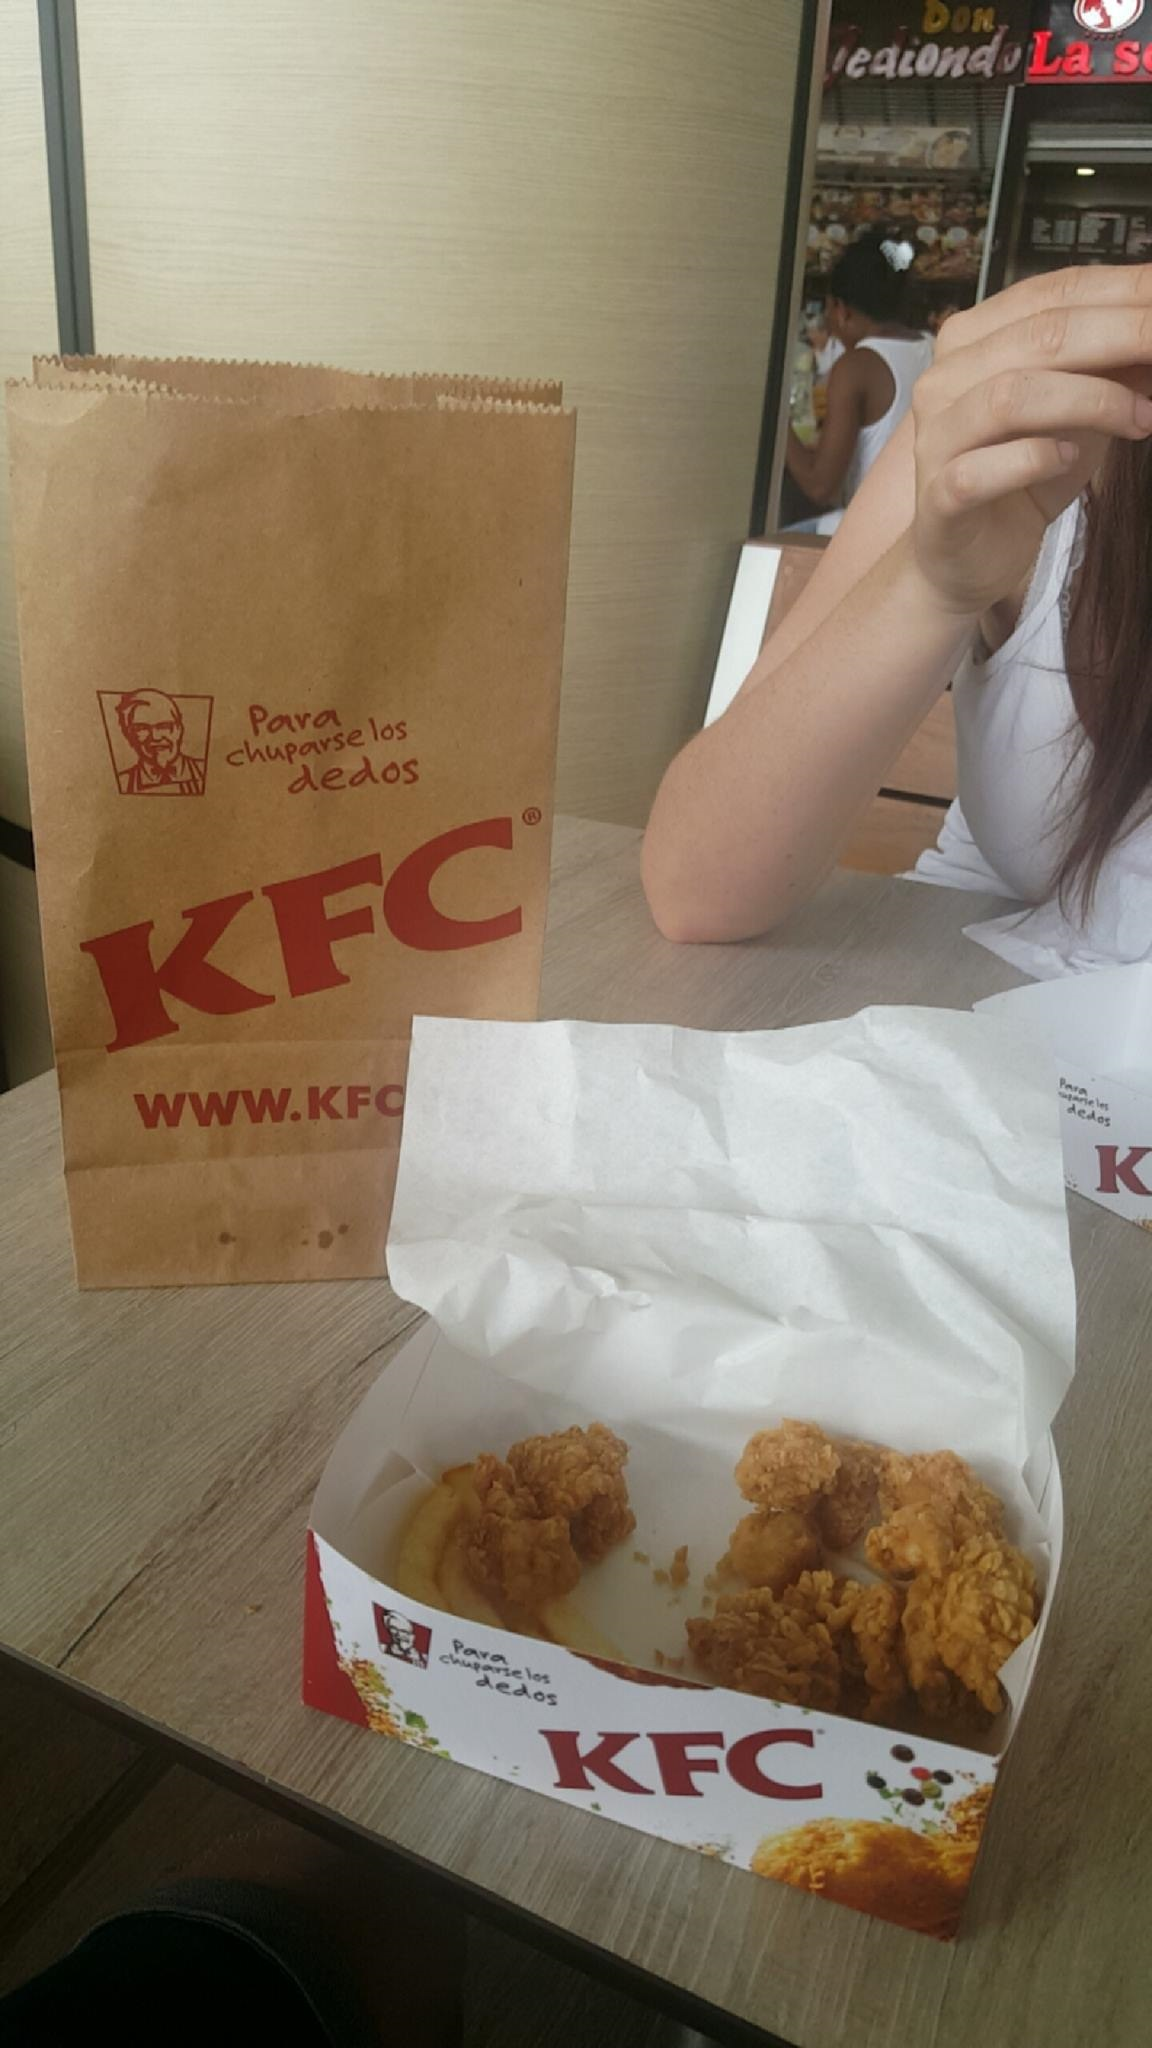 KFC Cali, Colombia